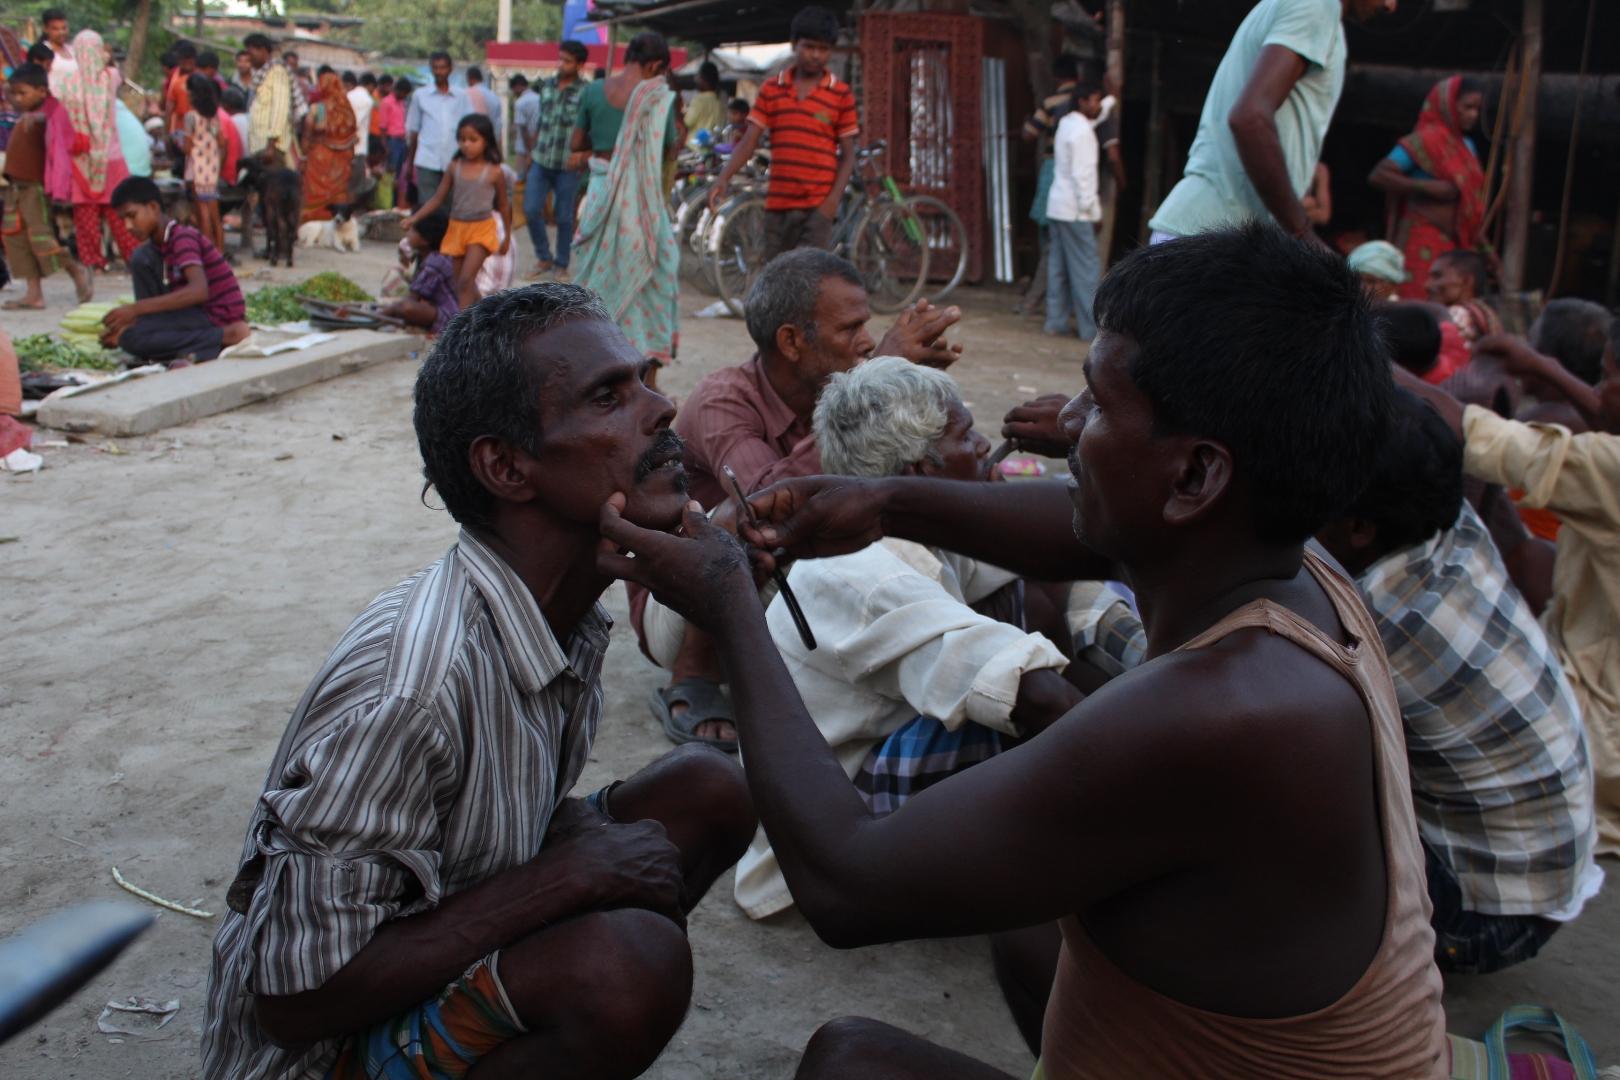 Barber grooms his client, Araria, 29 June 2016